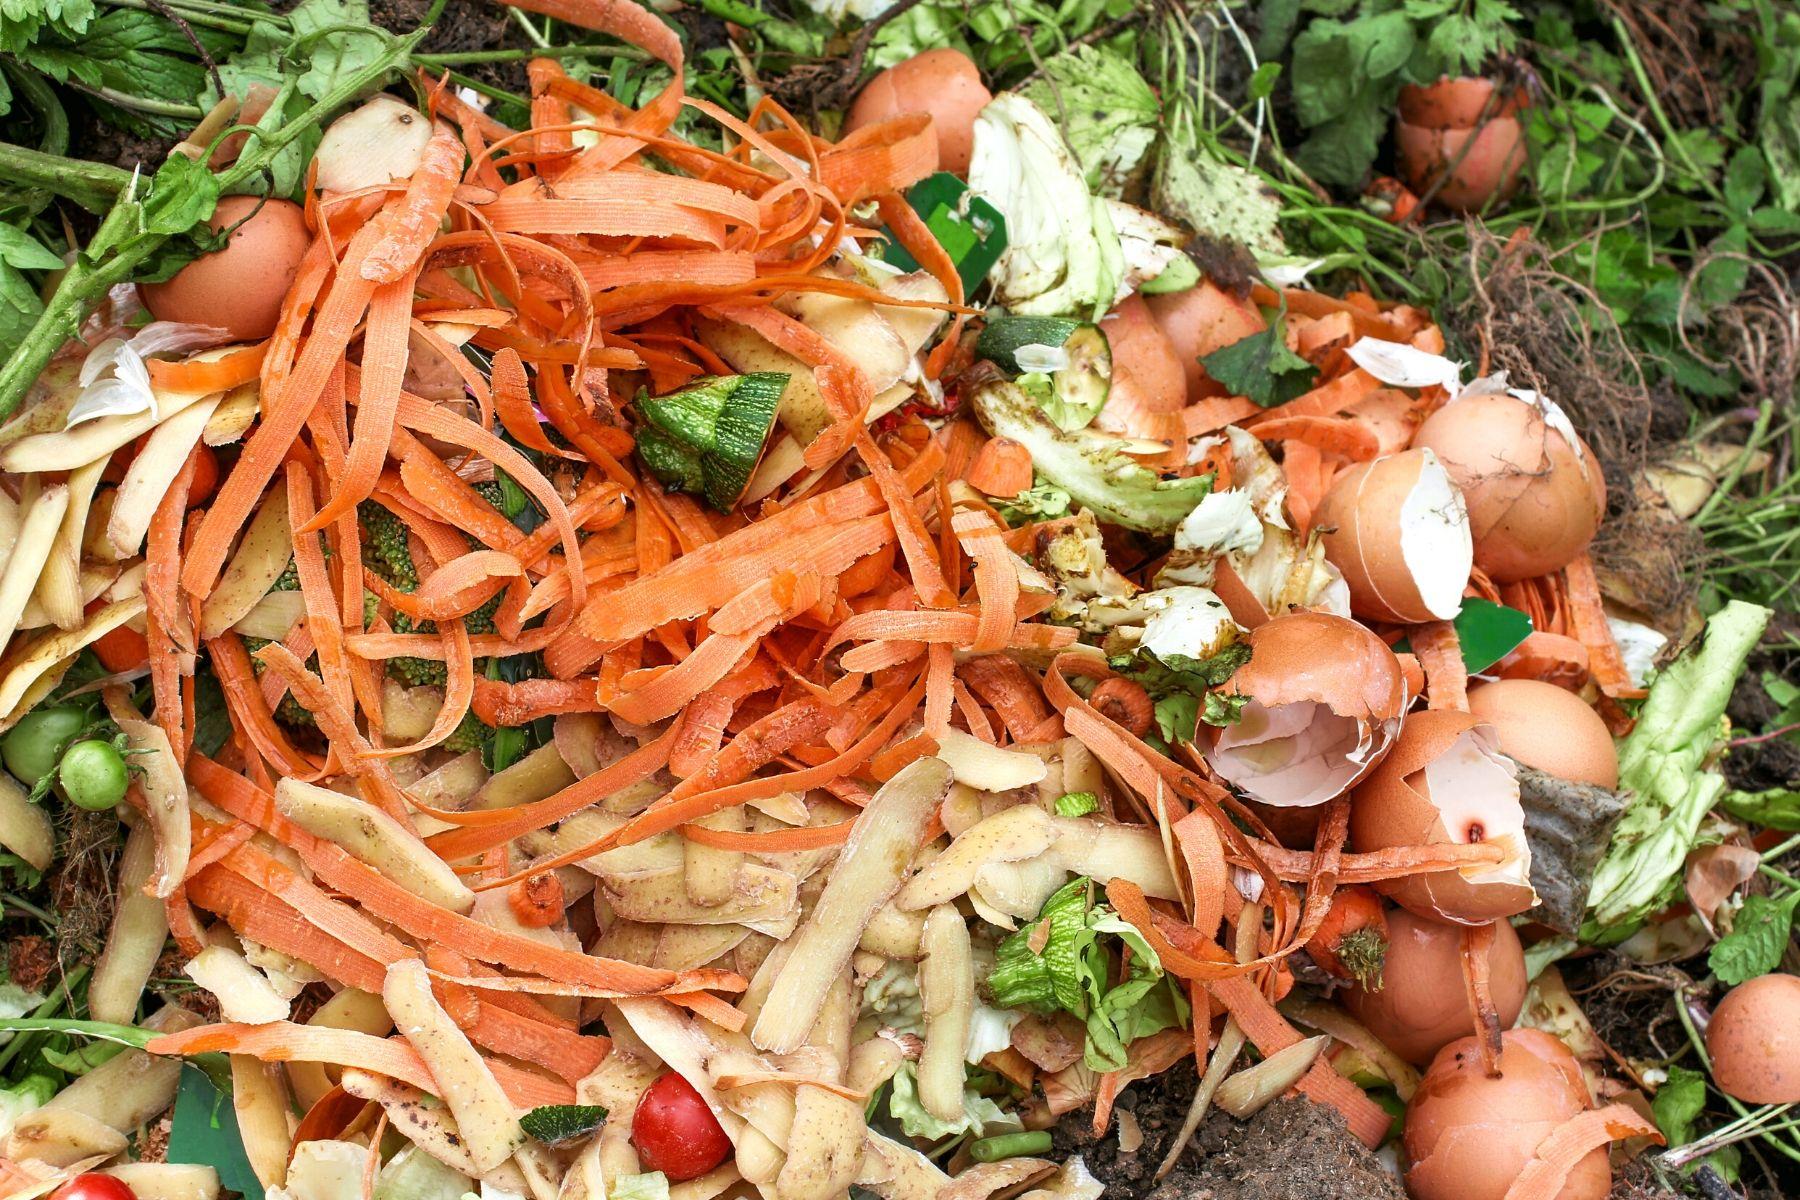 NJ_Food Waste Source: Canva